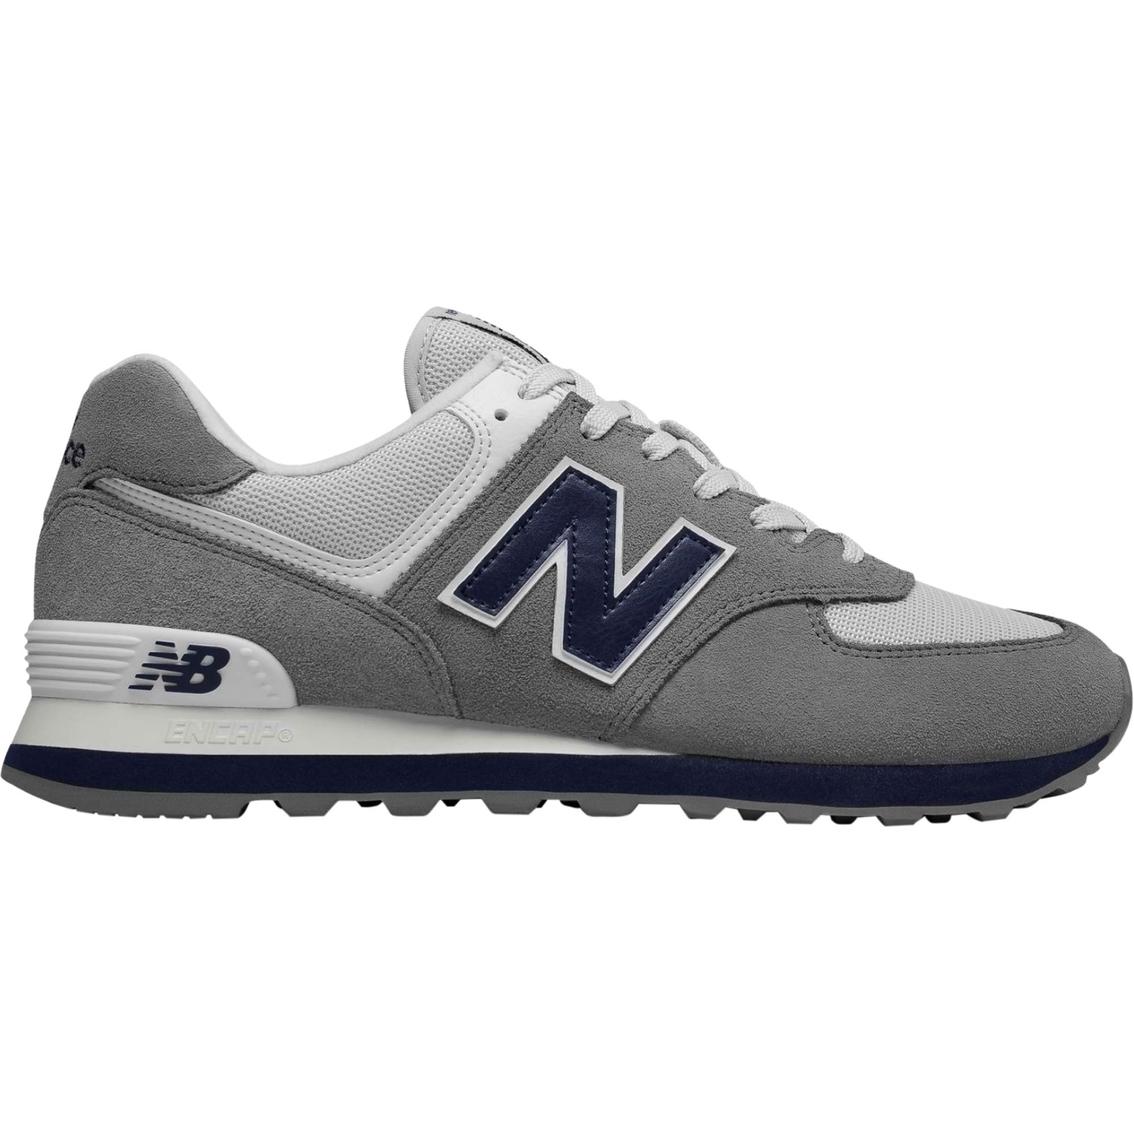 91983e9e583c New Balance Men s Ml574esd Lifestyle Core Plus Running Shoes ...